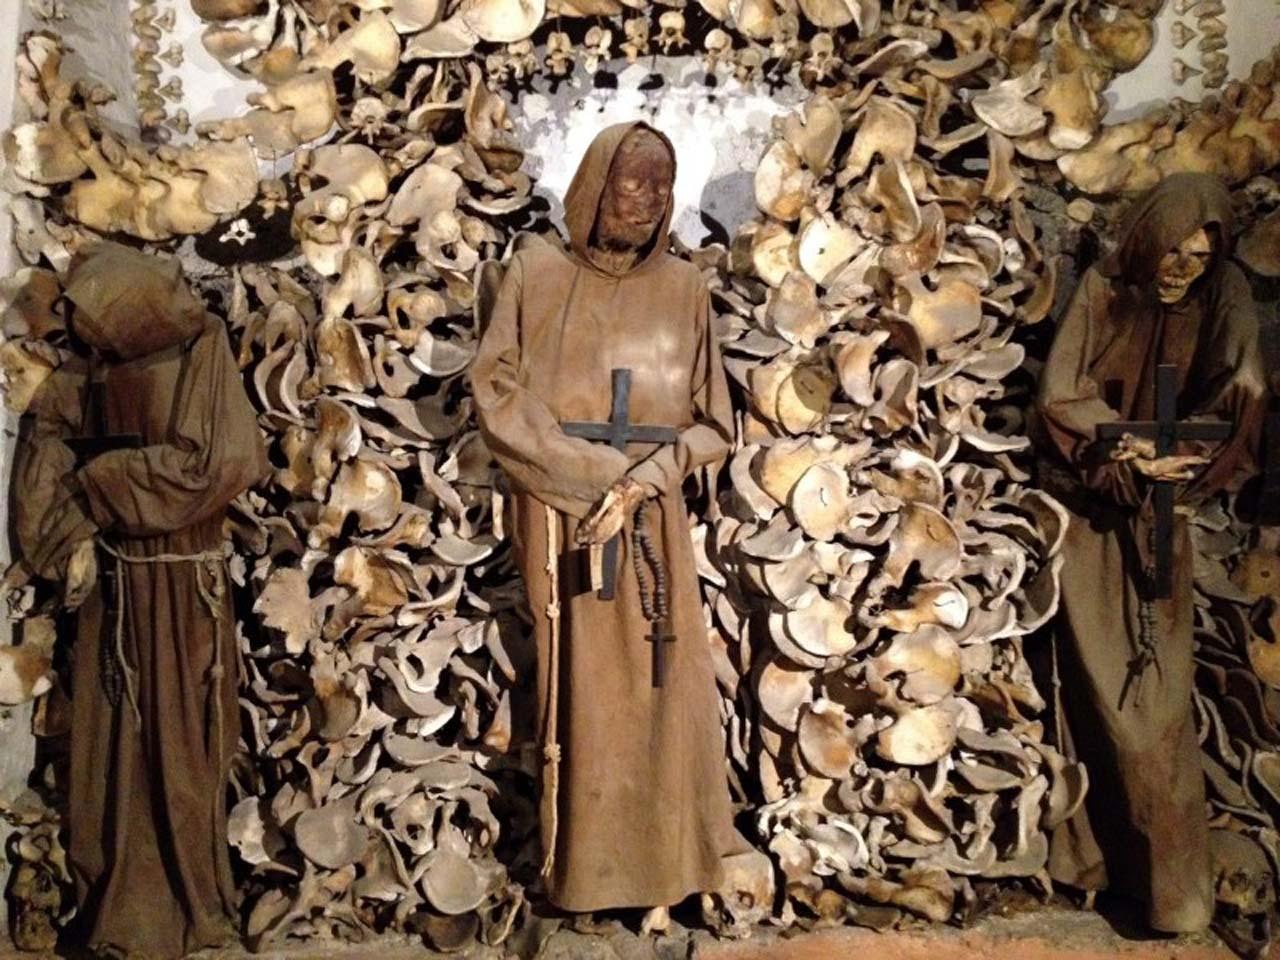 skeletons in church